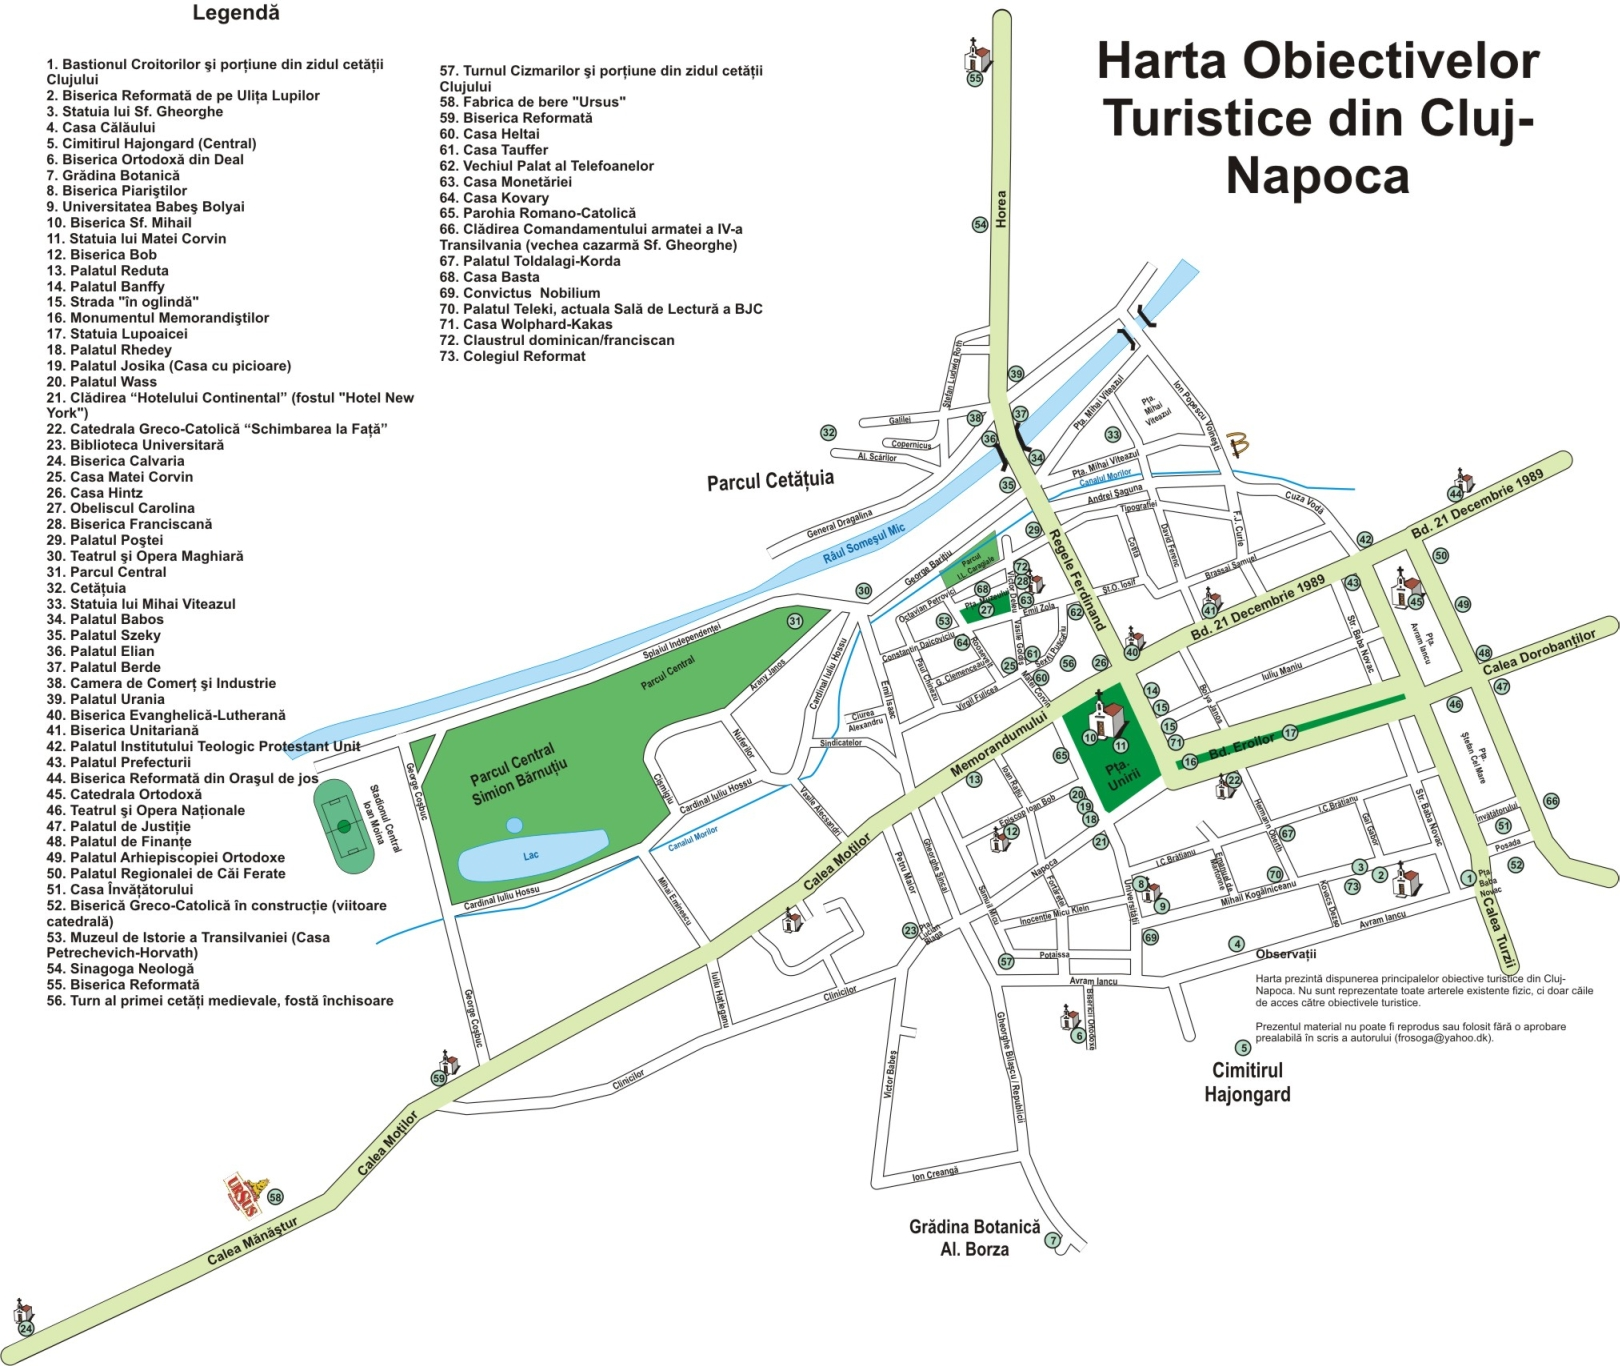 File Harta Obiective Turistice Cluj Napoca Jpg Wikimedia Commons